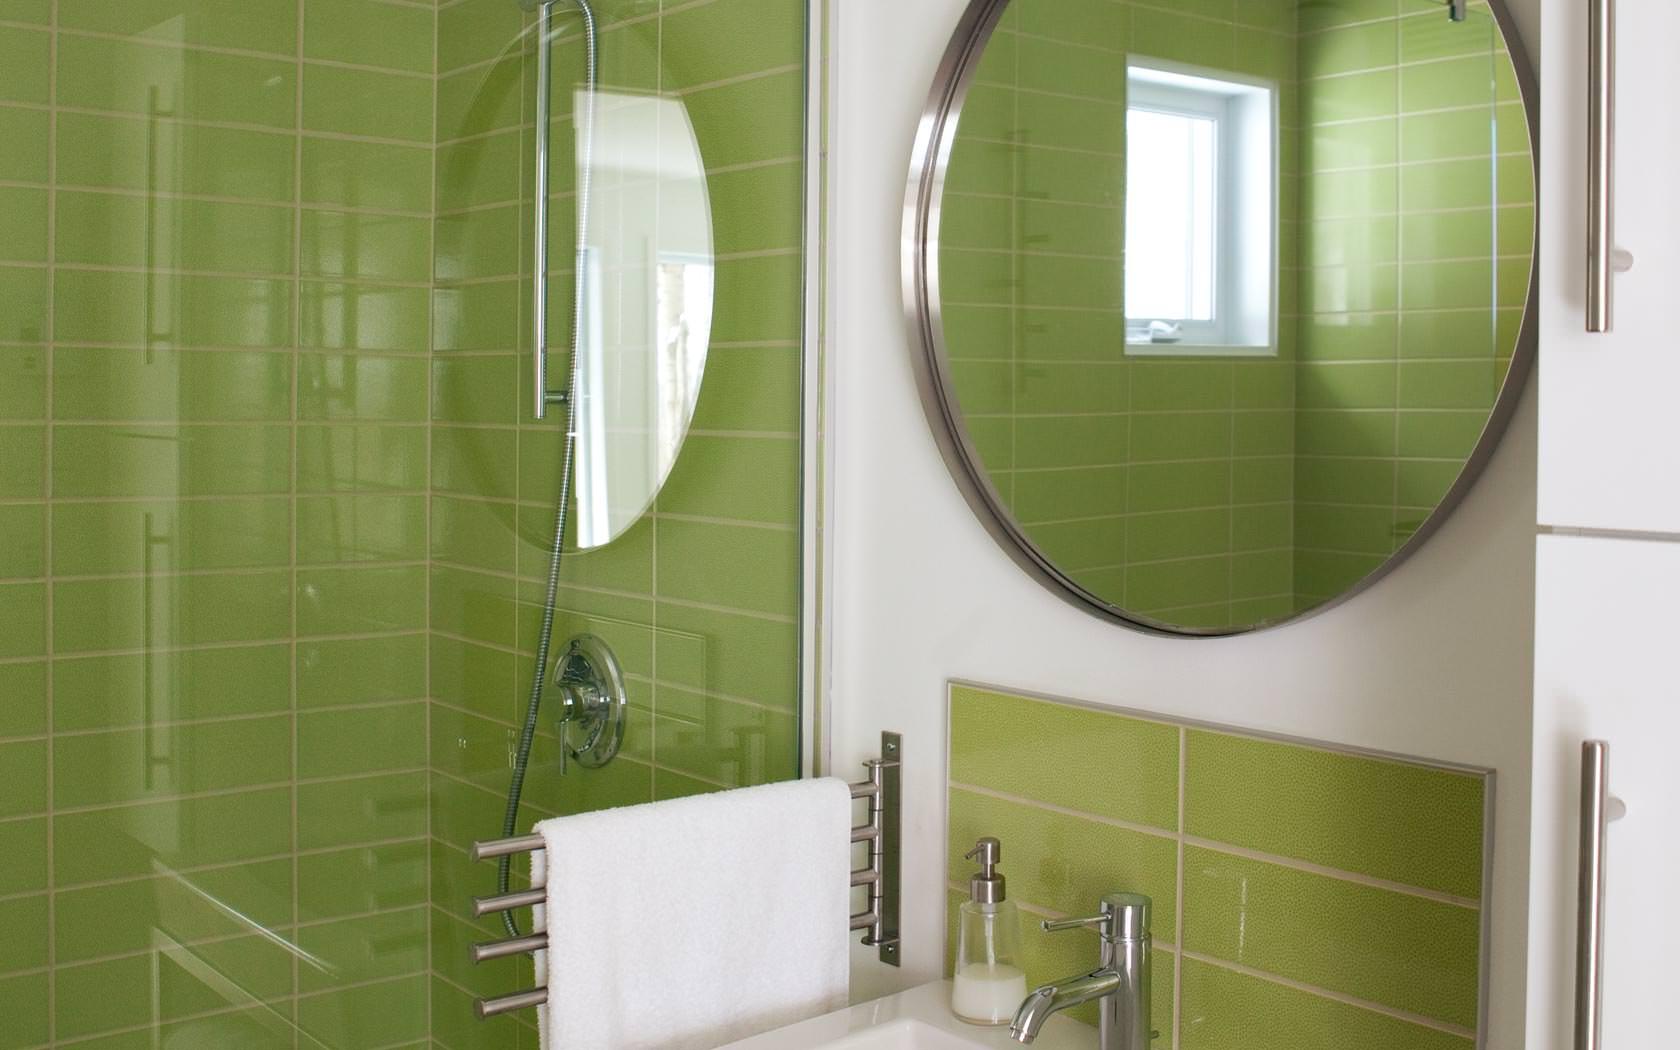 Salle de bain verte conceptions architecturales for Salle de bain verte